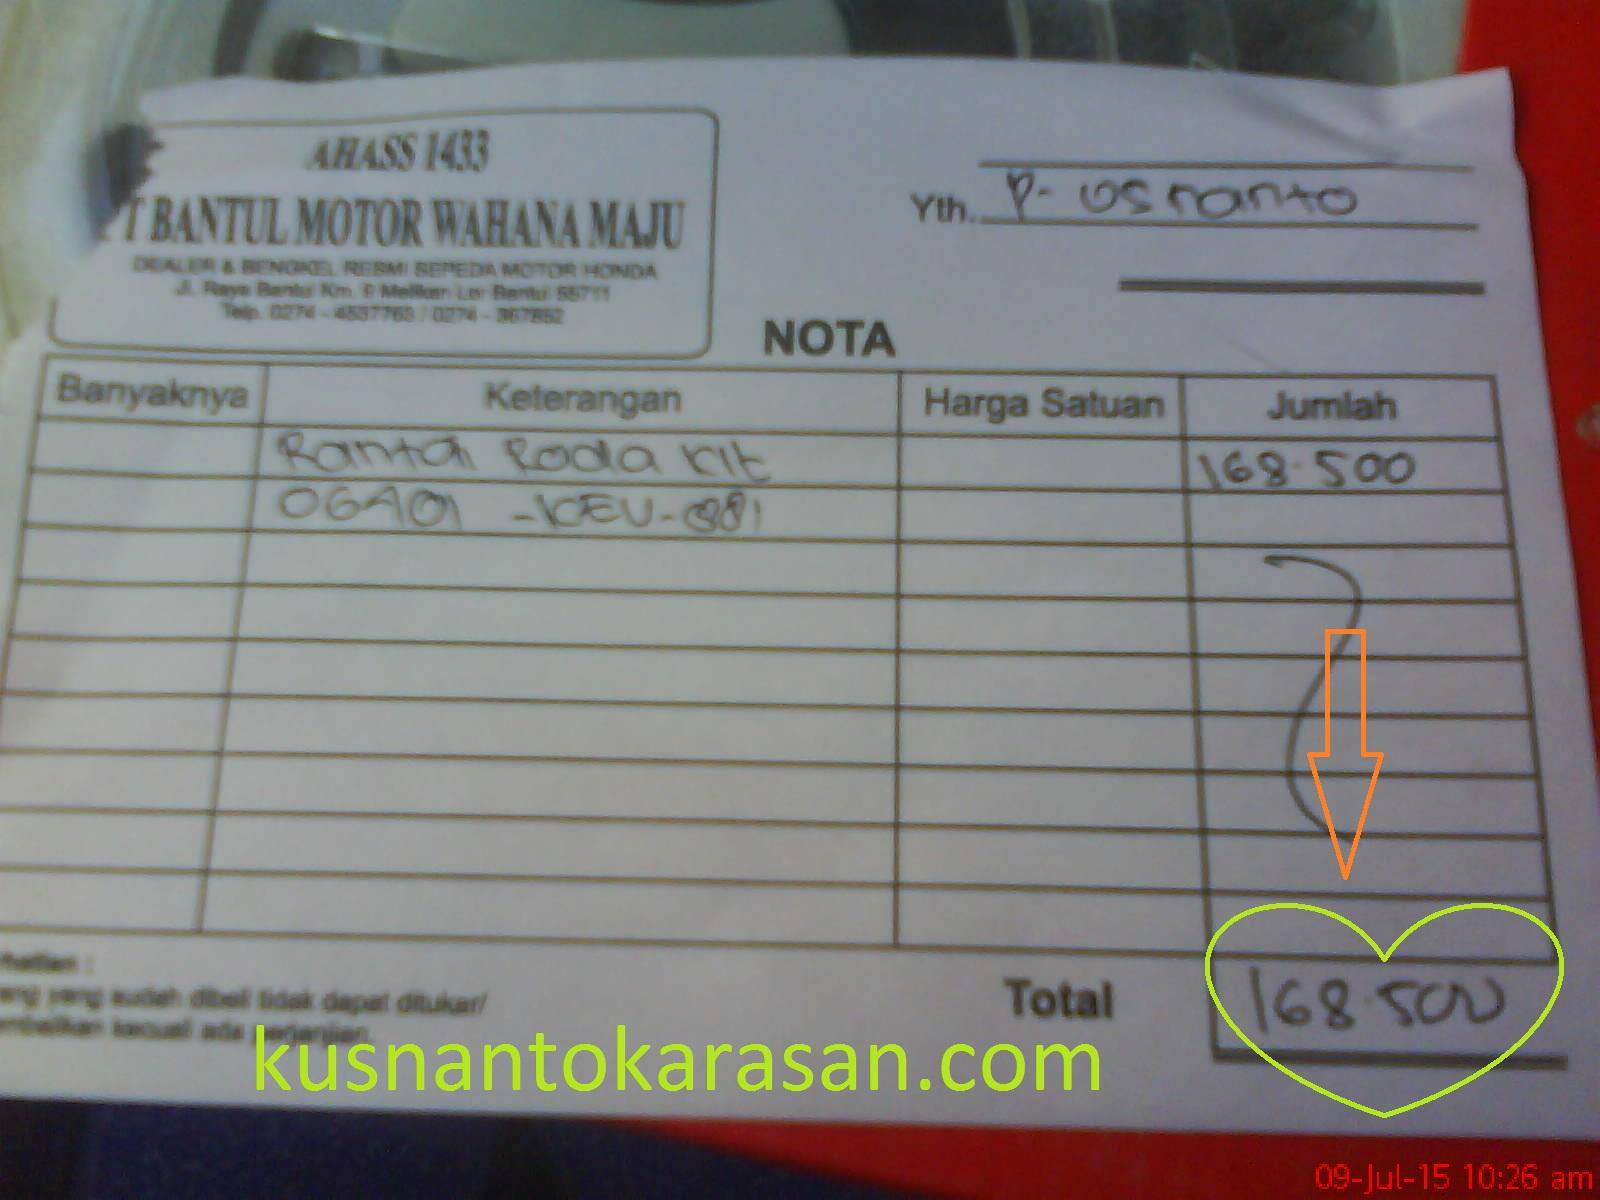 Service Motor Kusnantokarasancom